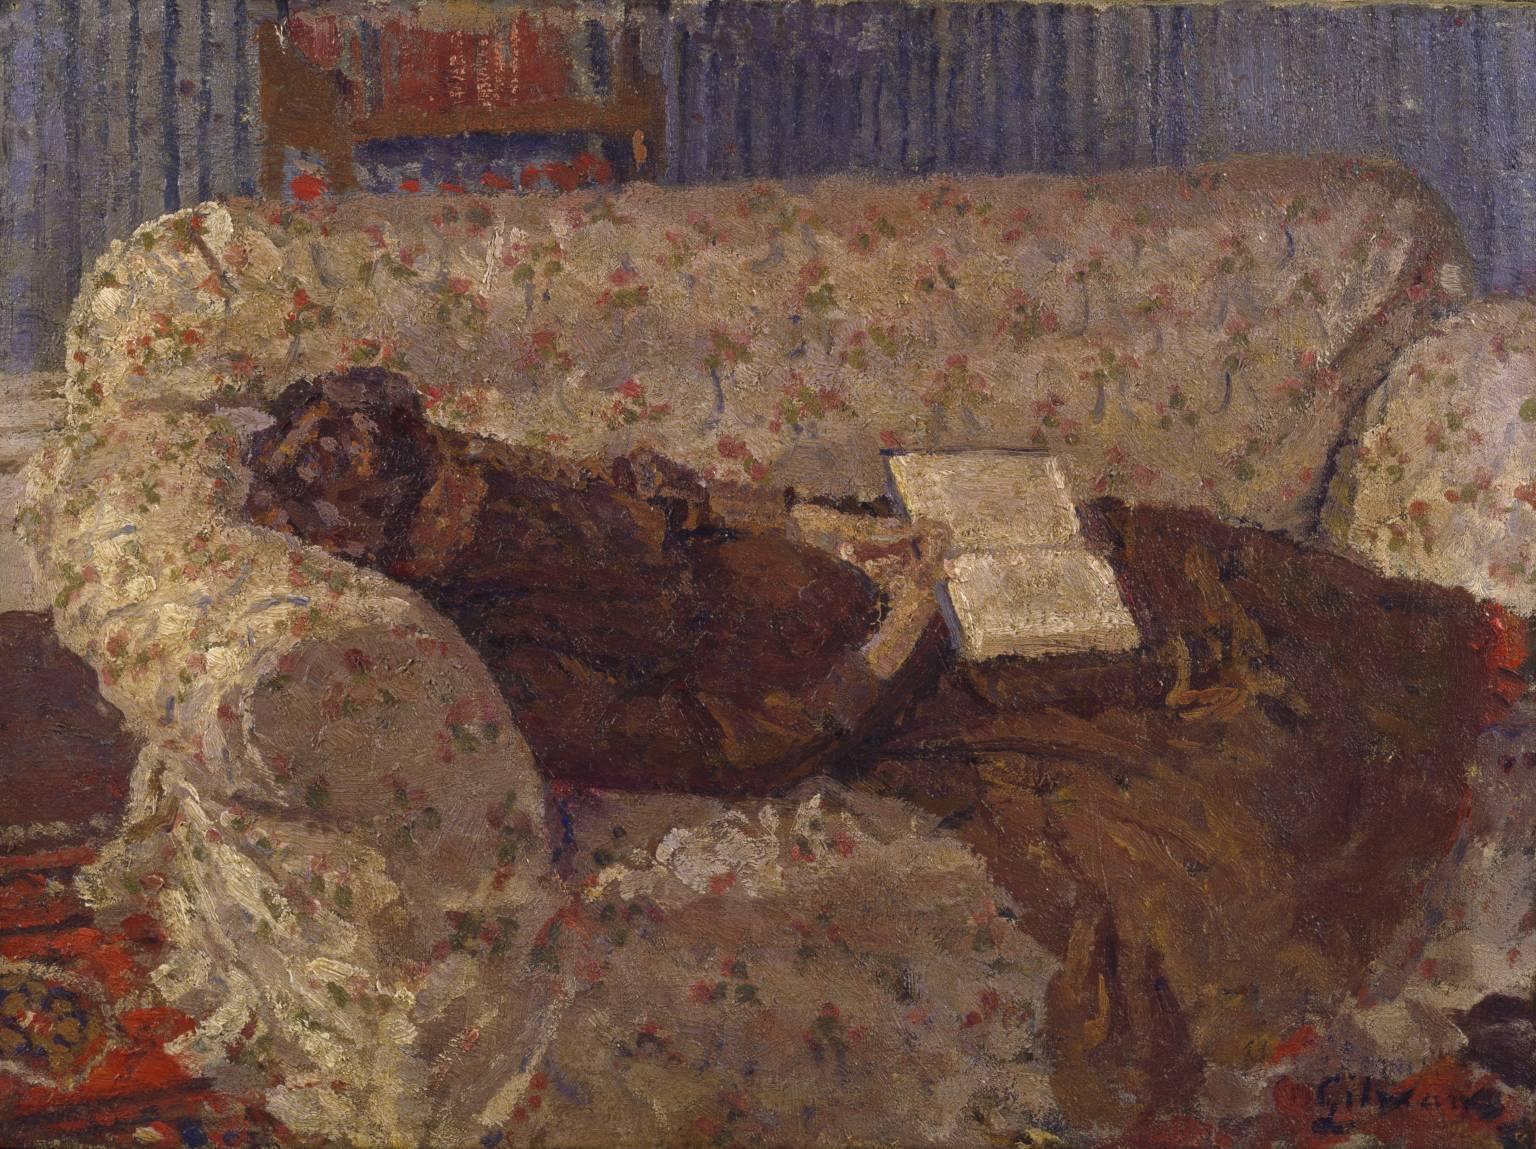 Lady on a Sofa, Harold Gilman, c 1910